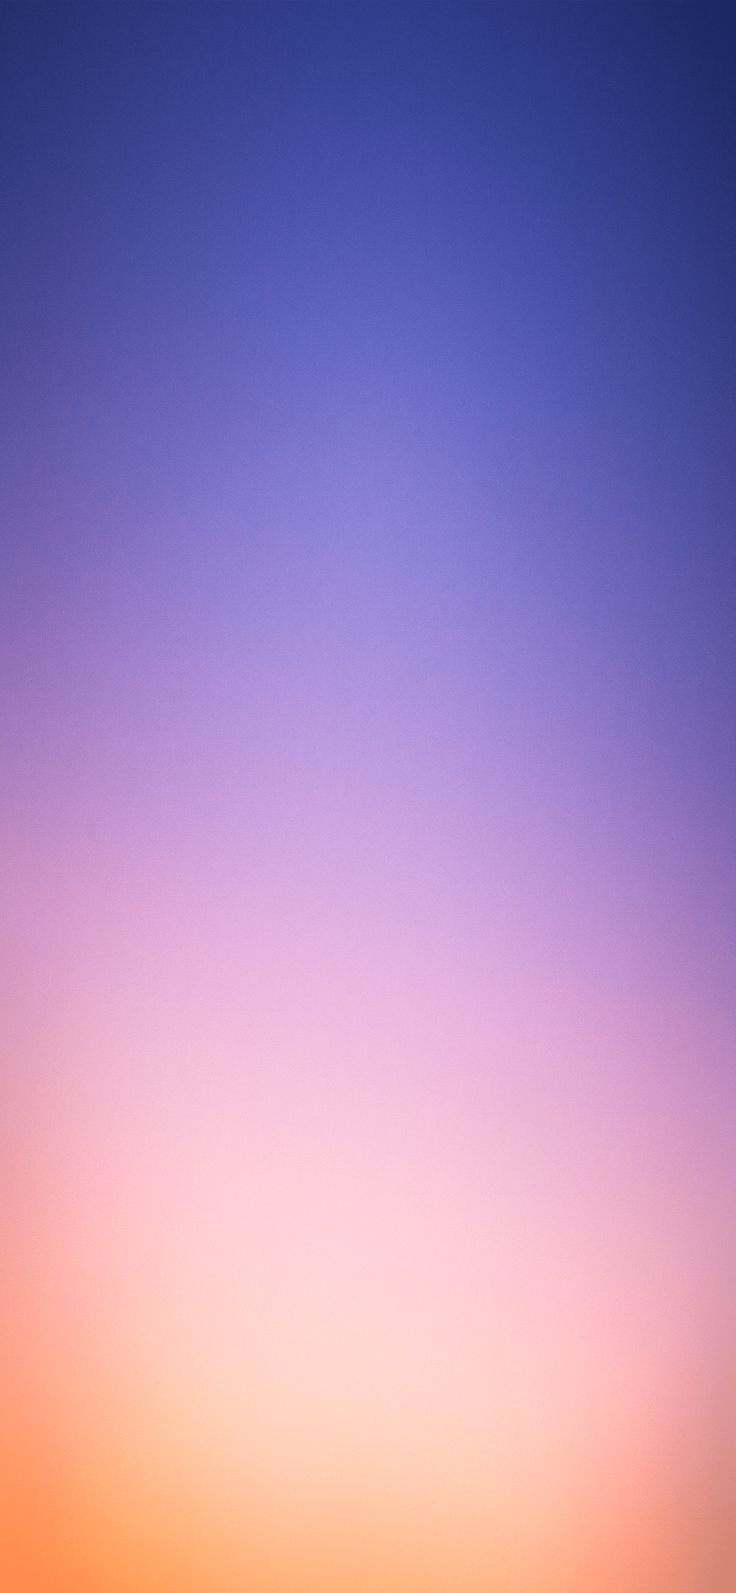 original apple-wallpaper für iphone x optimiert | 4k tapete | iphone